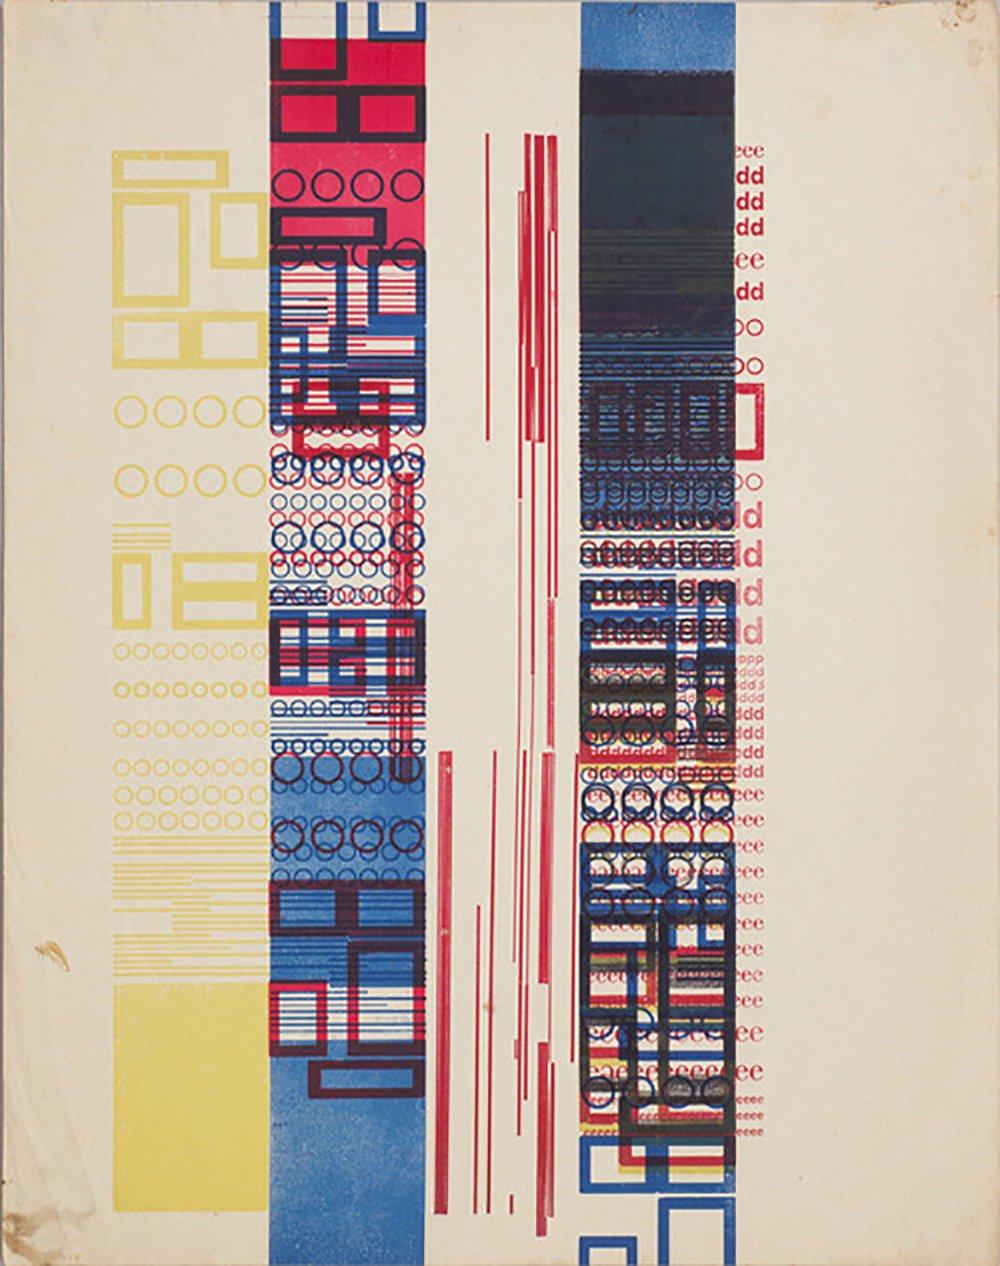 Karel-Martens-designplayground-11